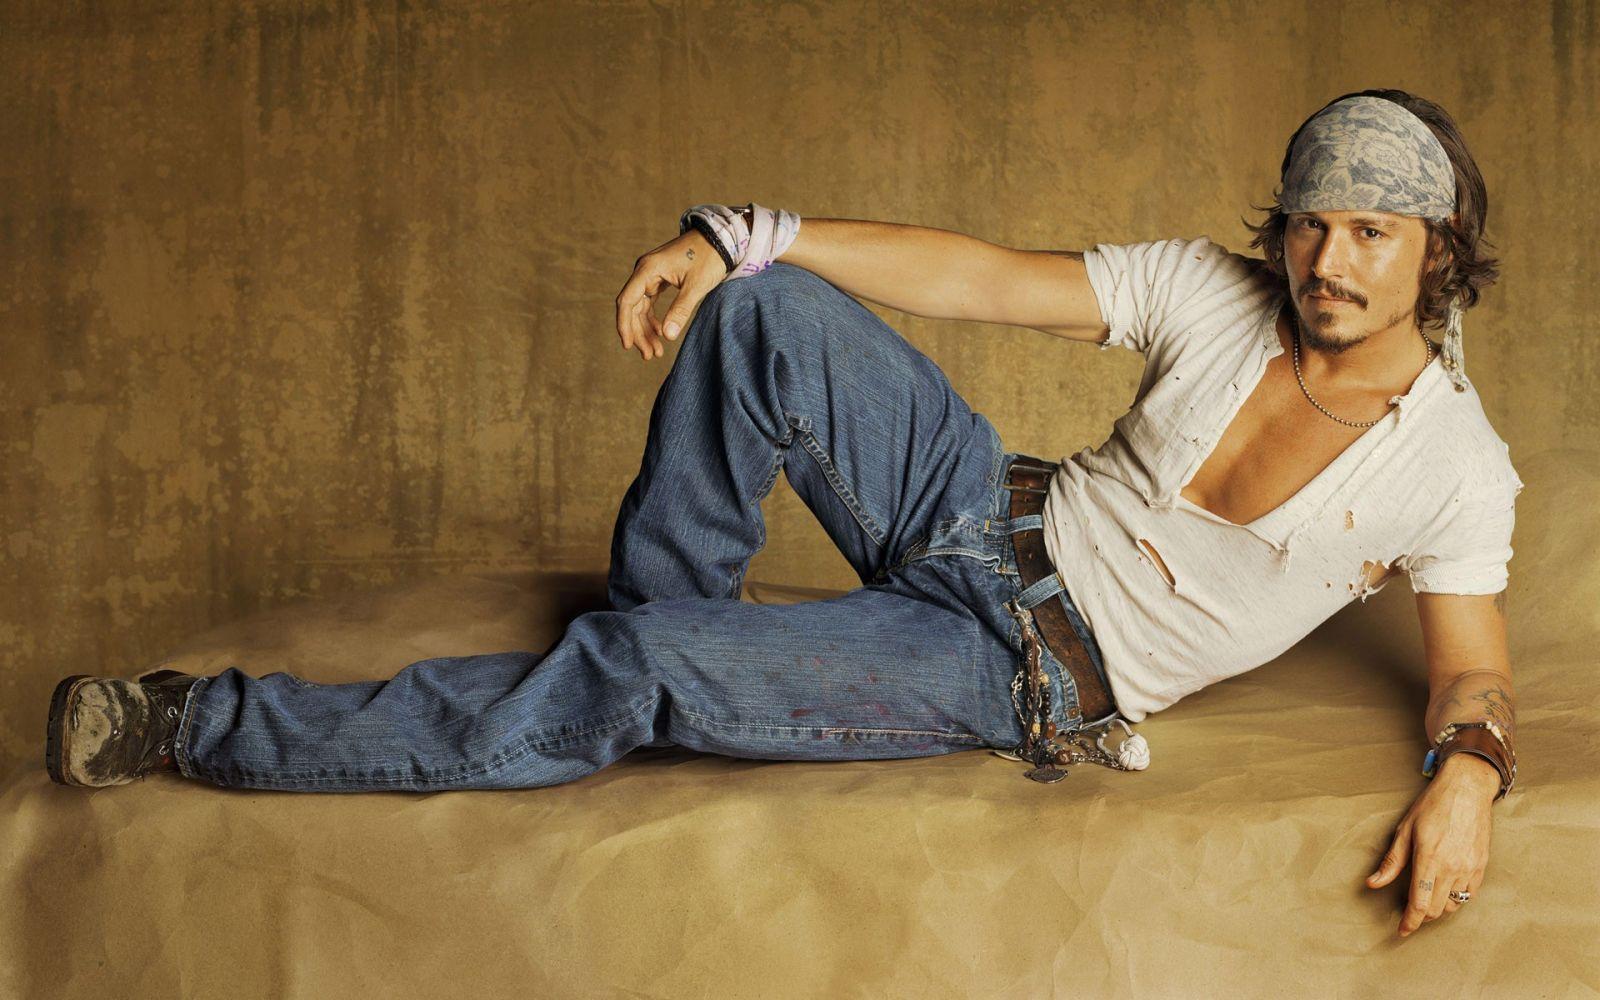 За что мы любим Джонни Деппа: 5 причин - фото №2